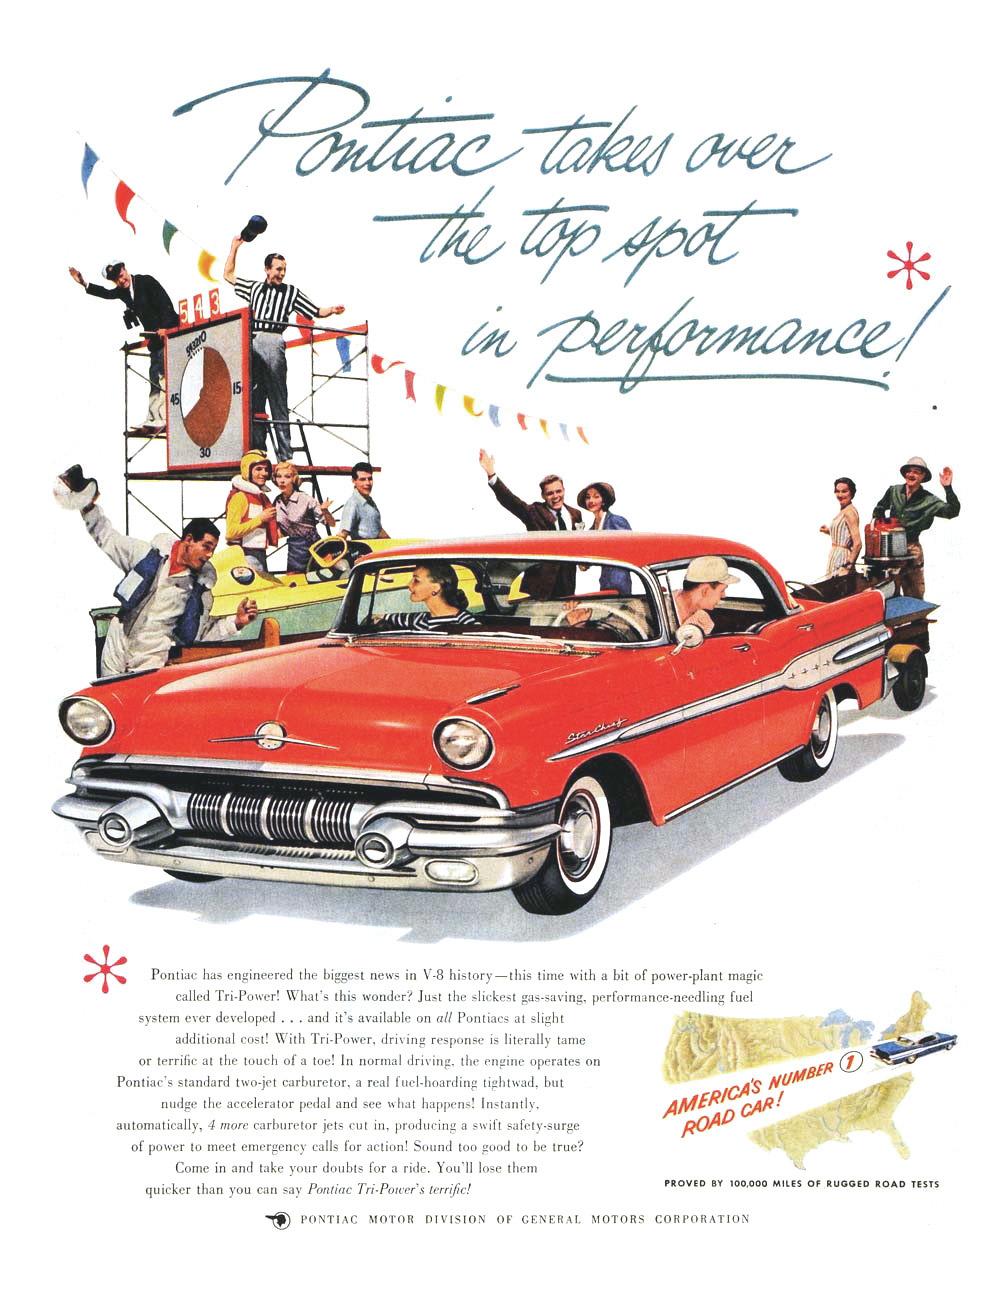 Pontiac Advertising Campaign 1957 America S Number 1